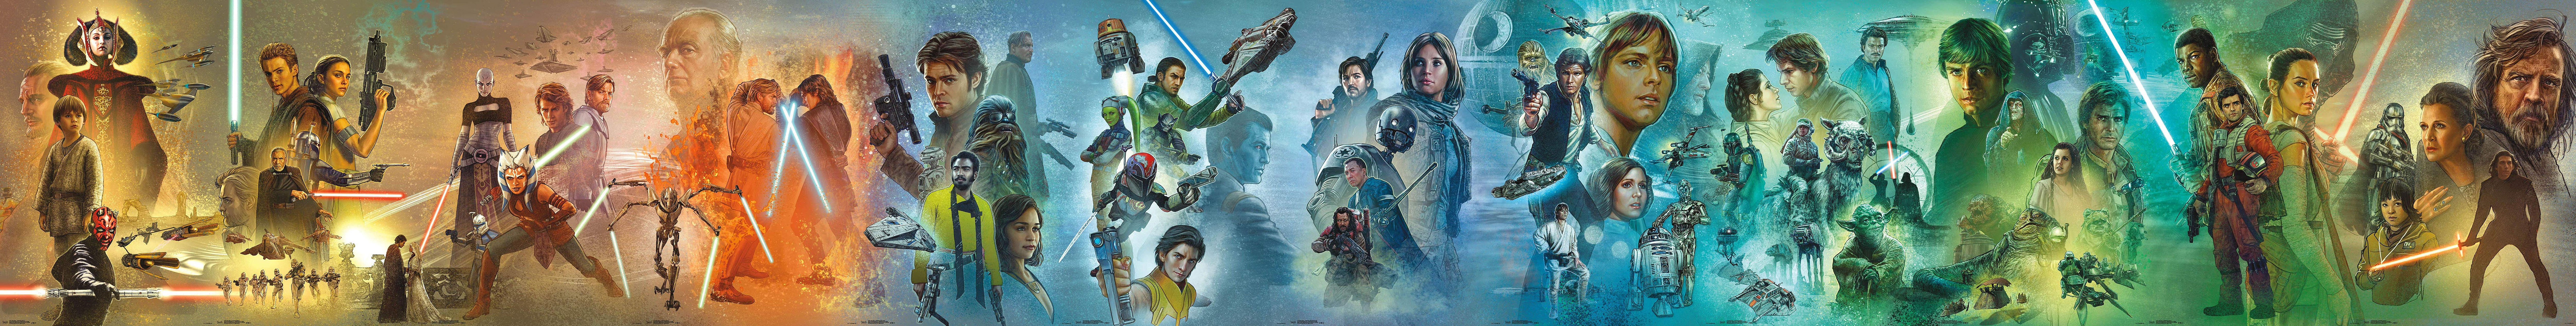 Star Wars Celebration Mural by Jason Palmer (HQ Version)